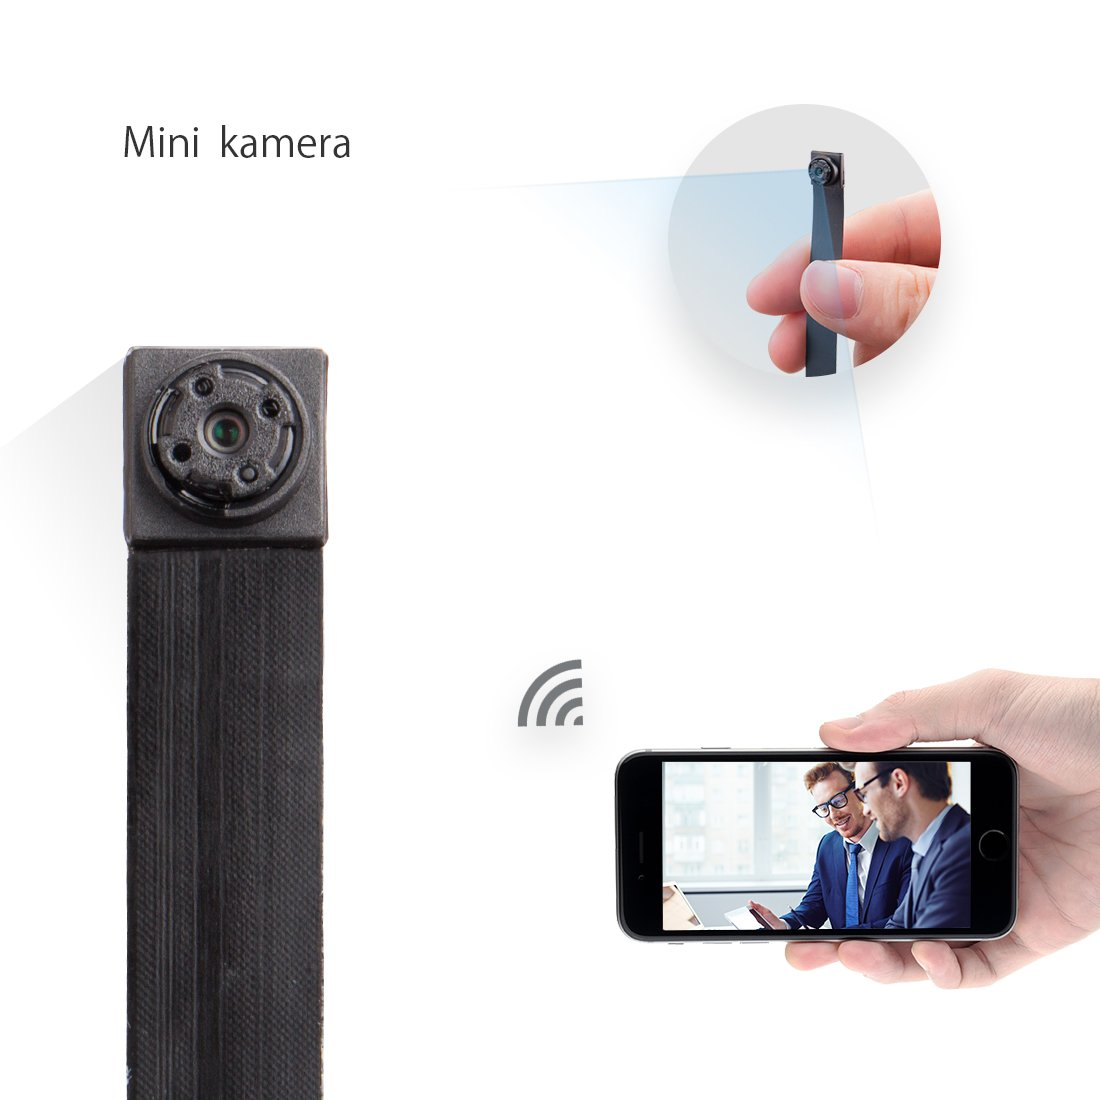 Mini Kamera ,FREDI HD 1080P Tragbare Wlan Netzwerk Klein IP Kamera Mini  Kamera P2P Drathlos